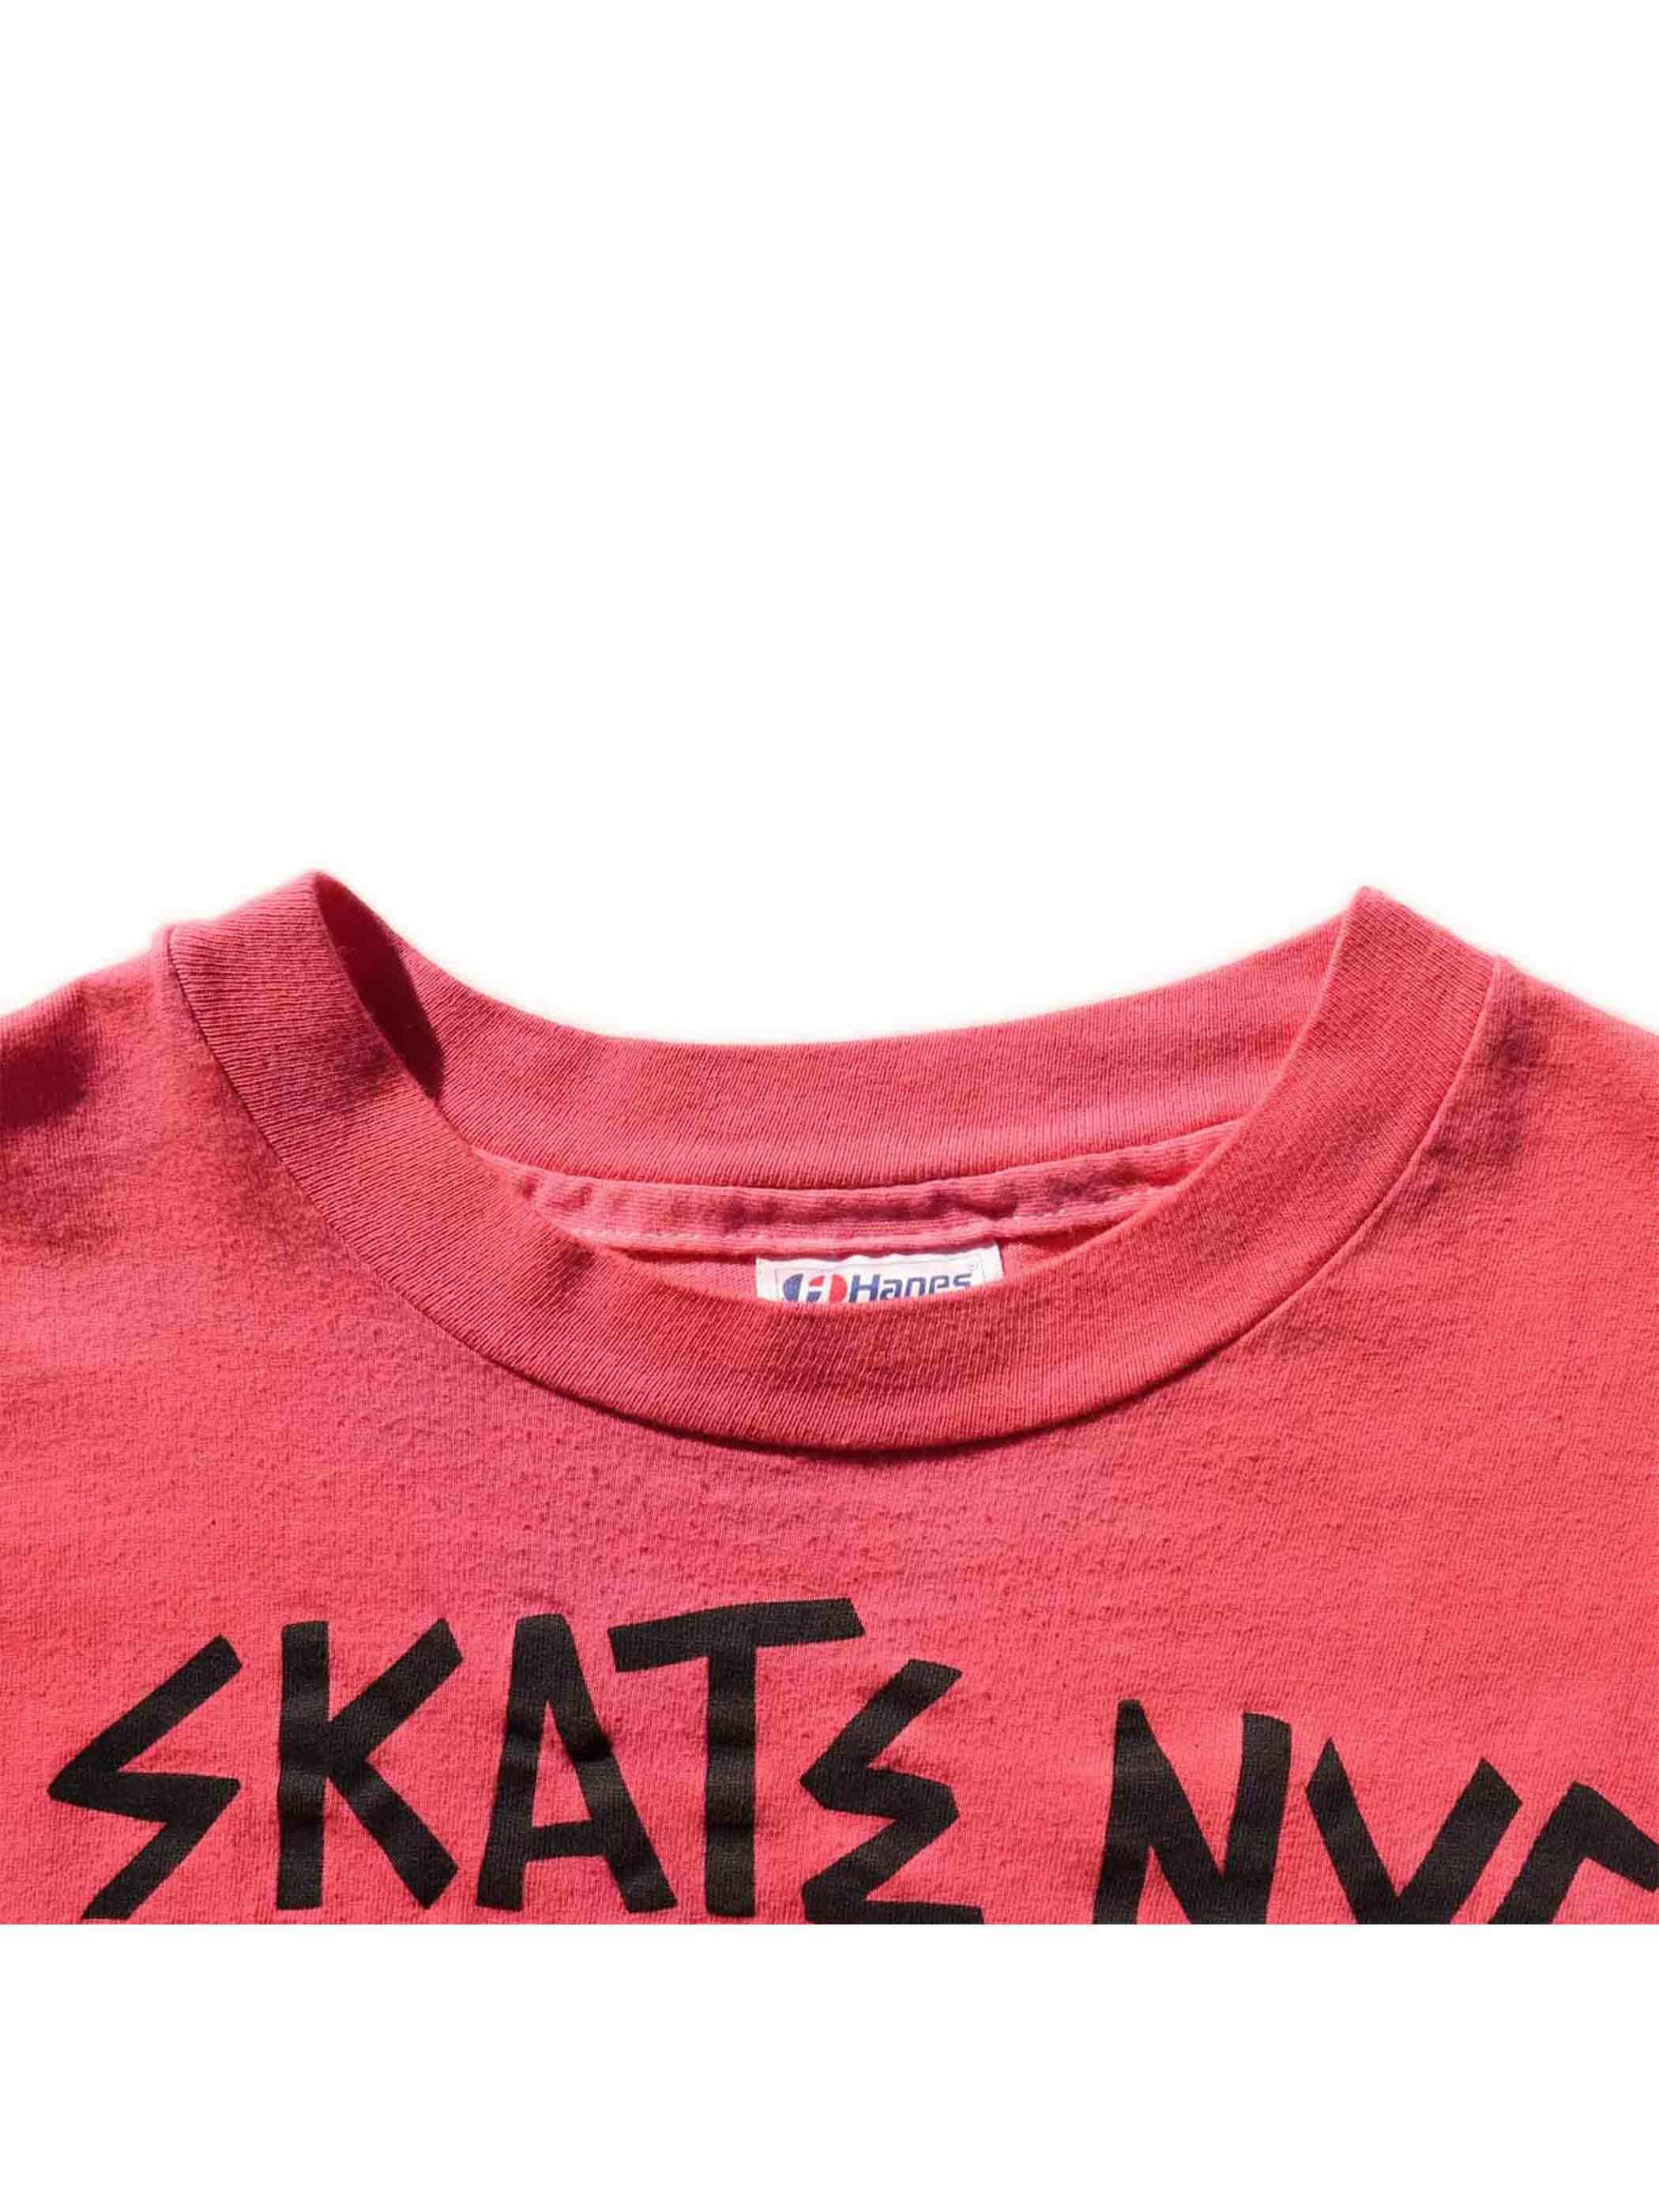 "90's SKATE NYC CENTRAL PARK ""ピンクオーバーダイ"" プリントTシャツ [XL]"